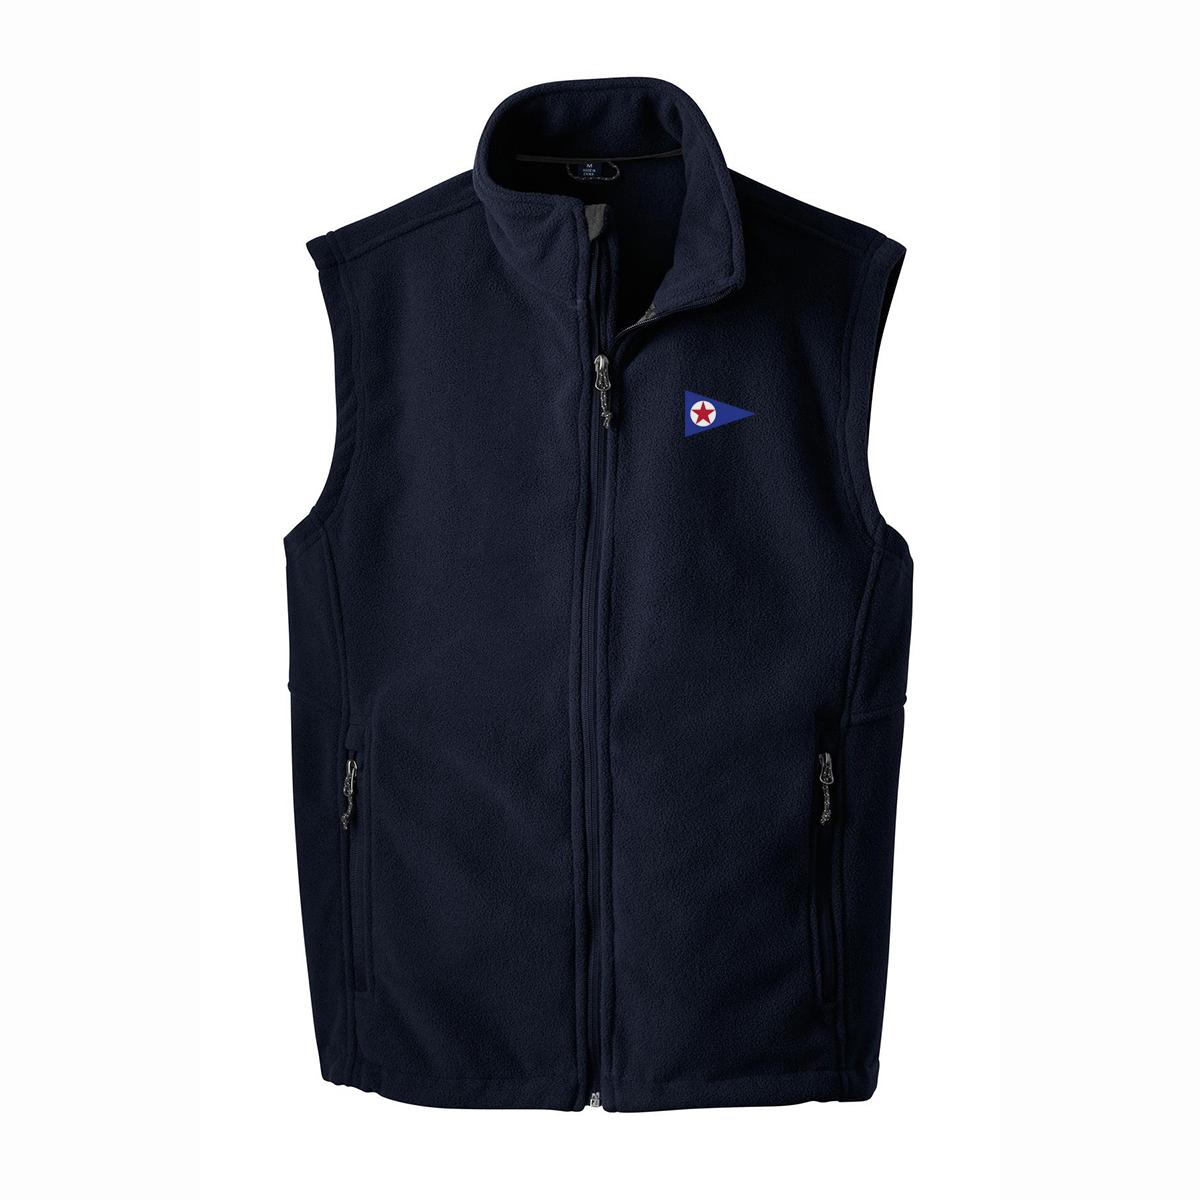 Barnstable Yacht Club - Men's Value Fleece Vest